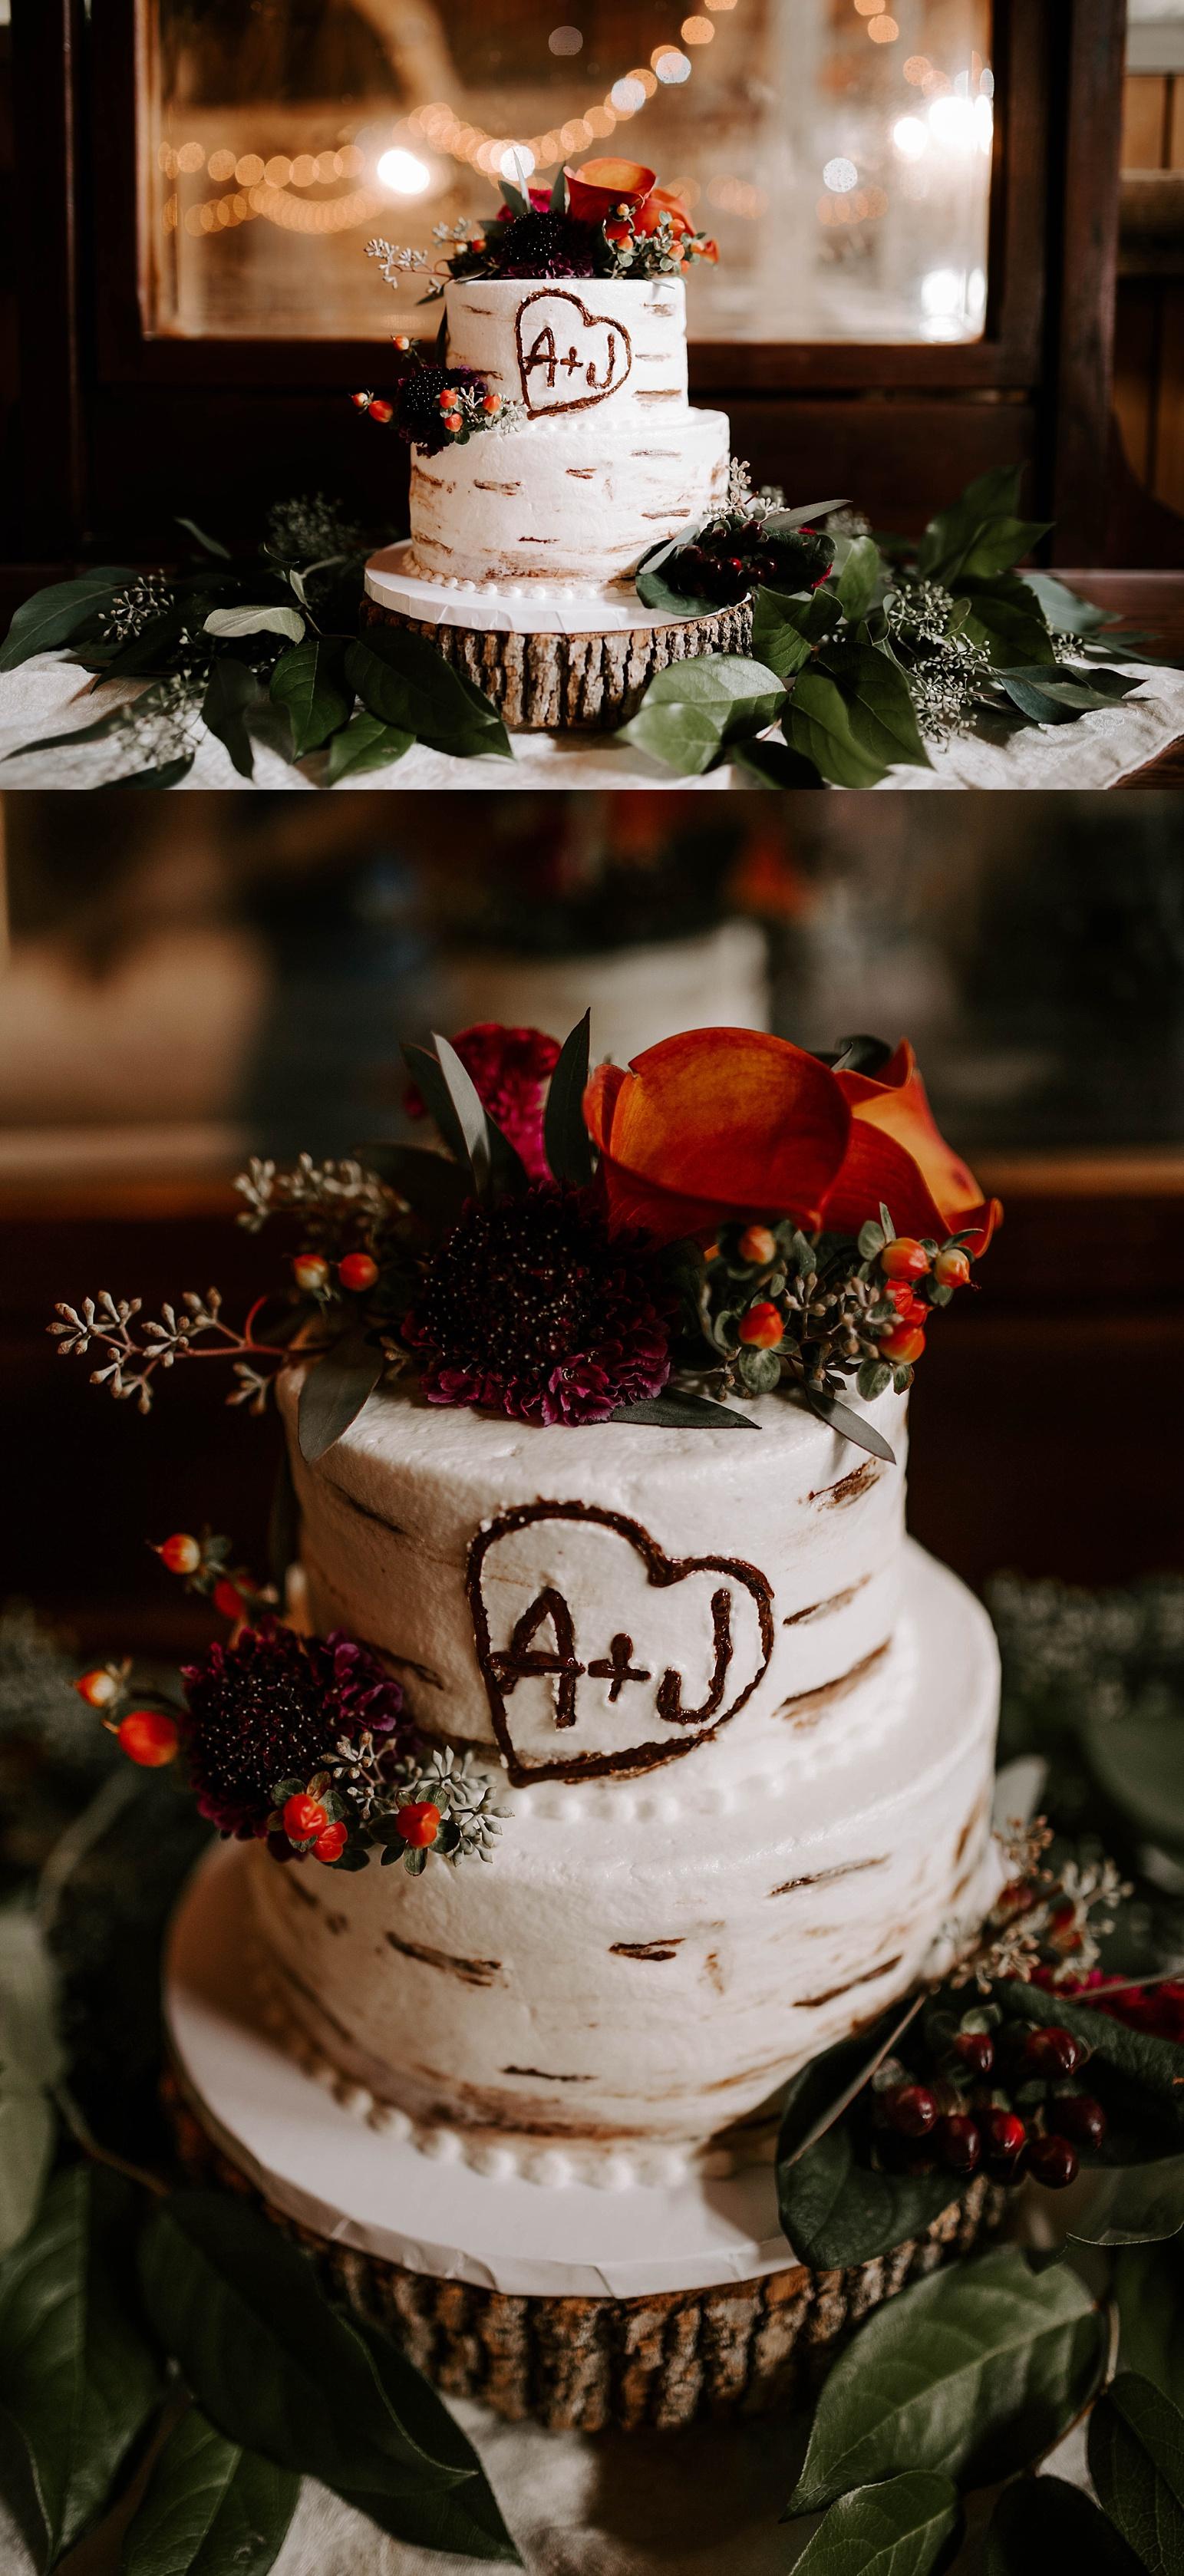 ashley_sara_photography_pittsburgh-wedding-photographer_ohio-wedding-photographer_destination-wedding-photographer3.jpg